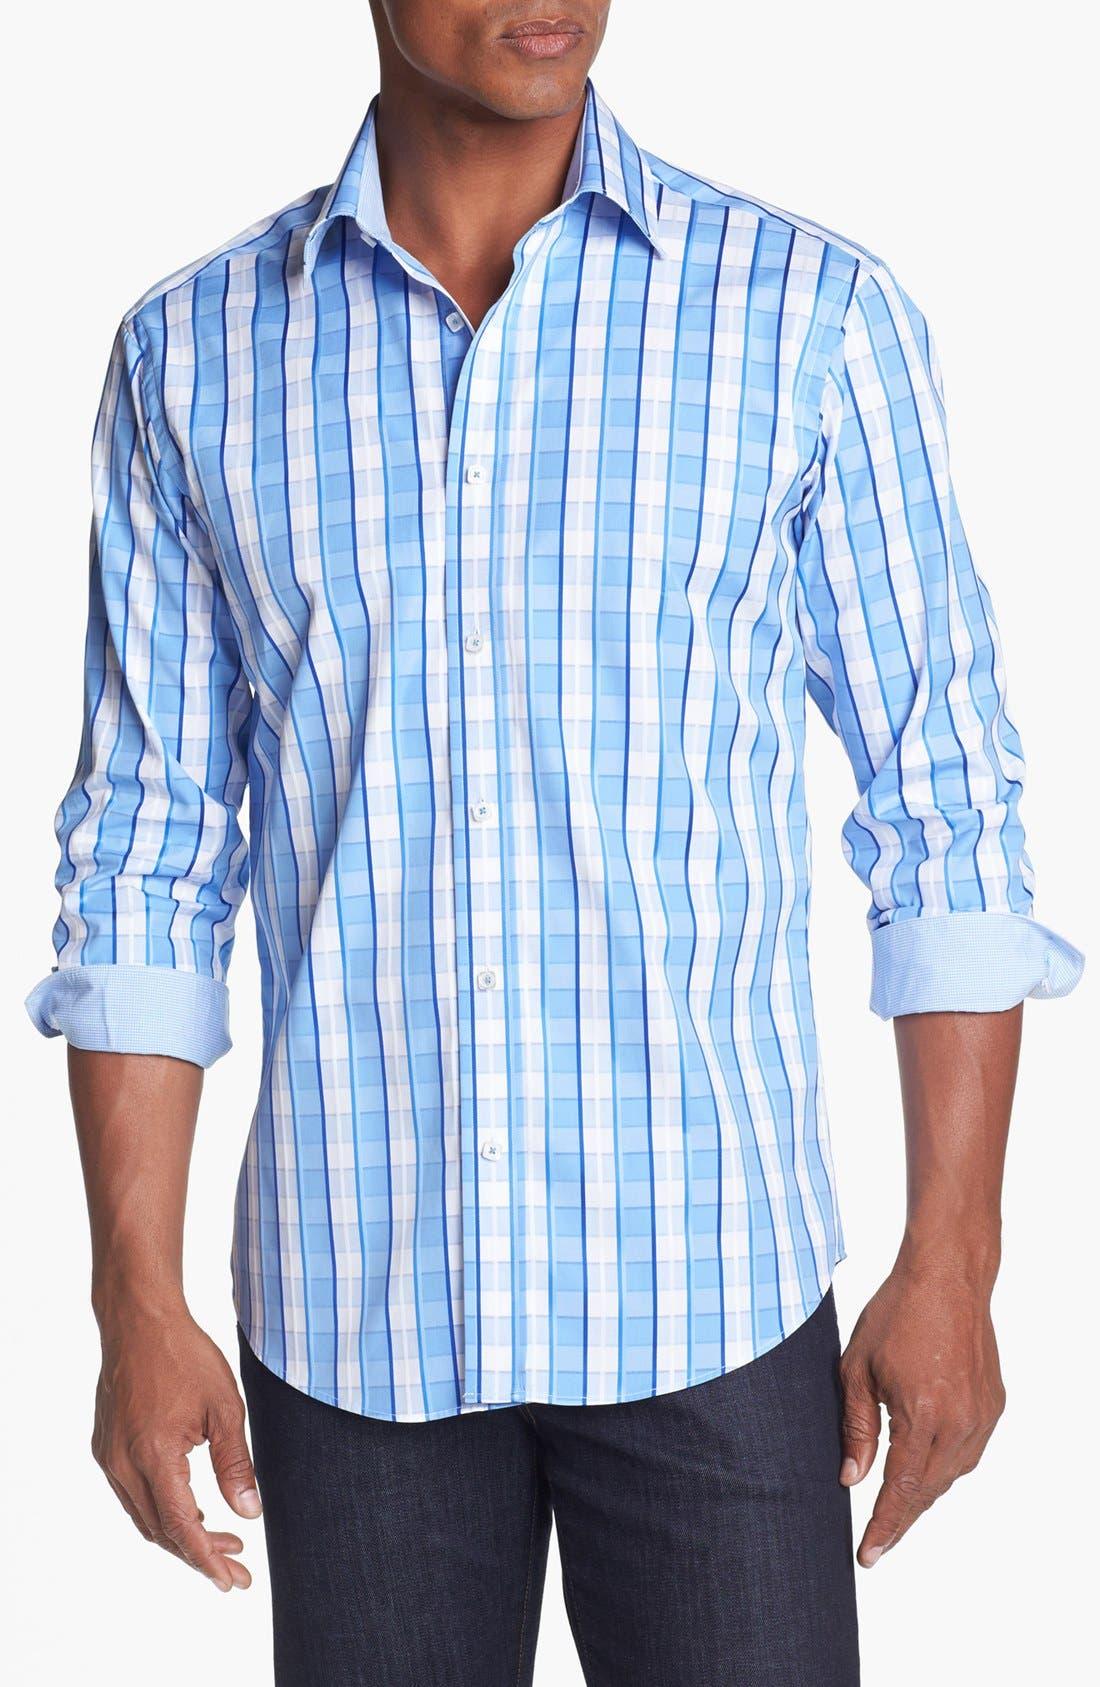 Main Image - Bugatchi Check Shaped Fit Cotton Sport Shirt